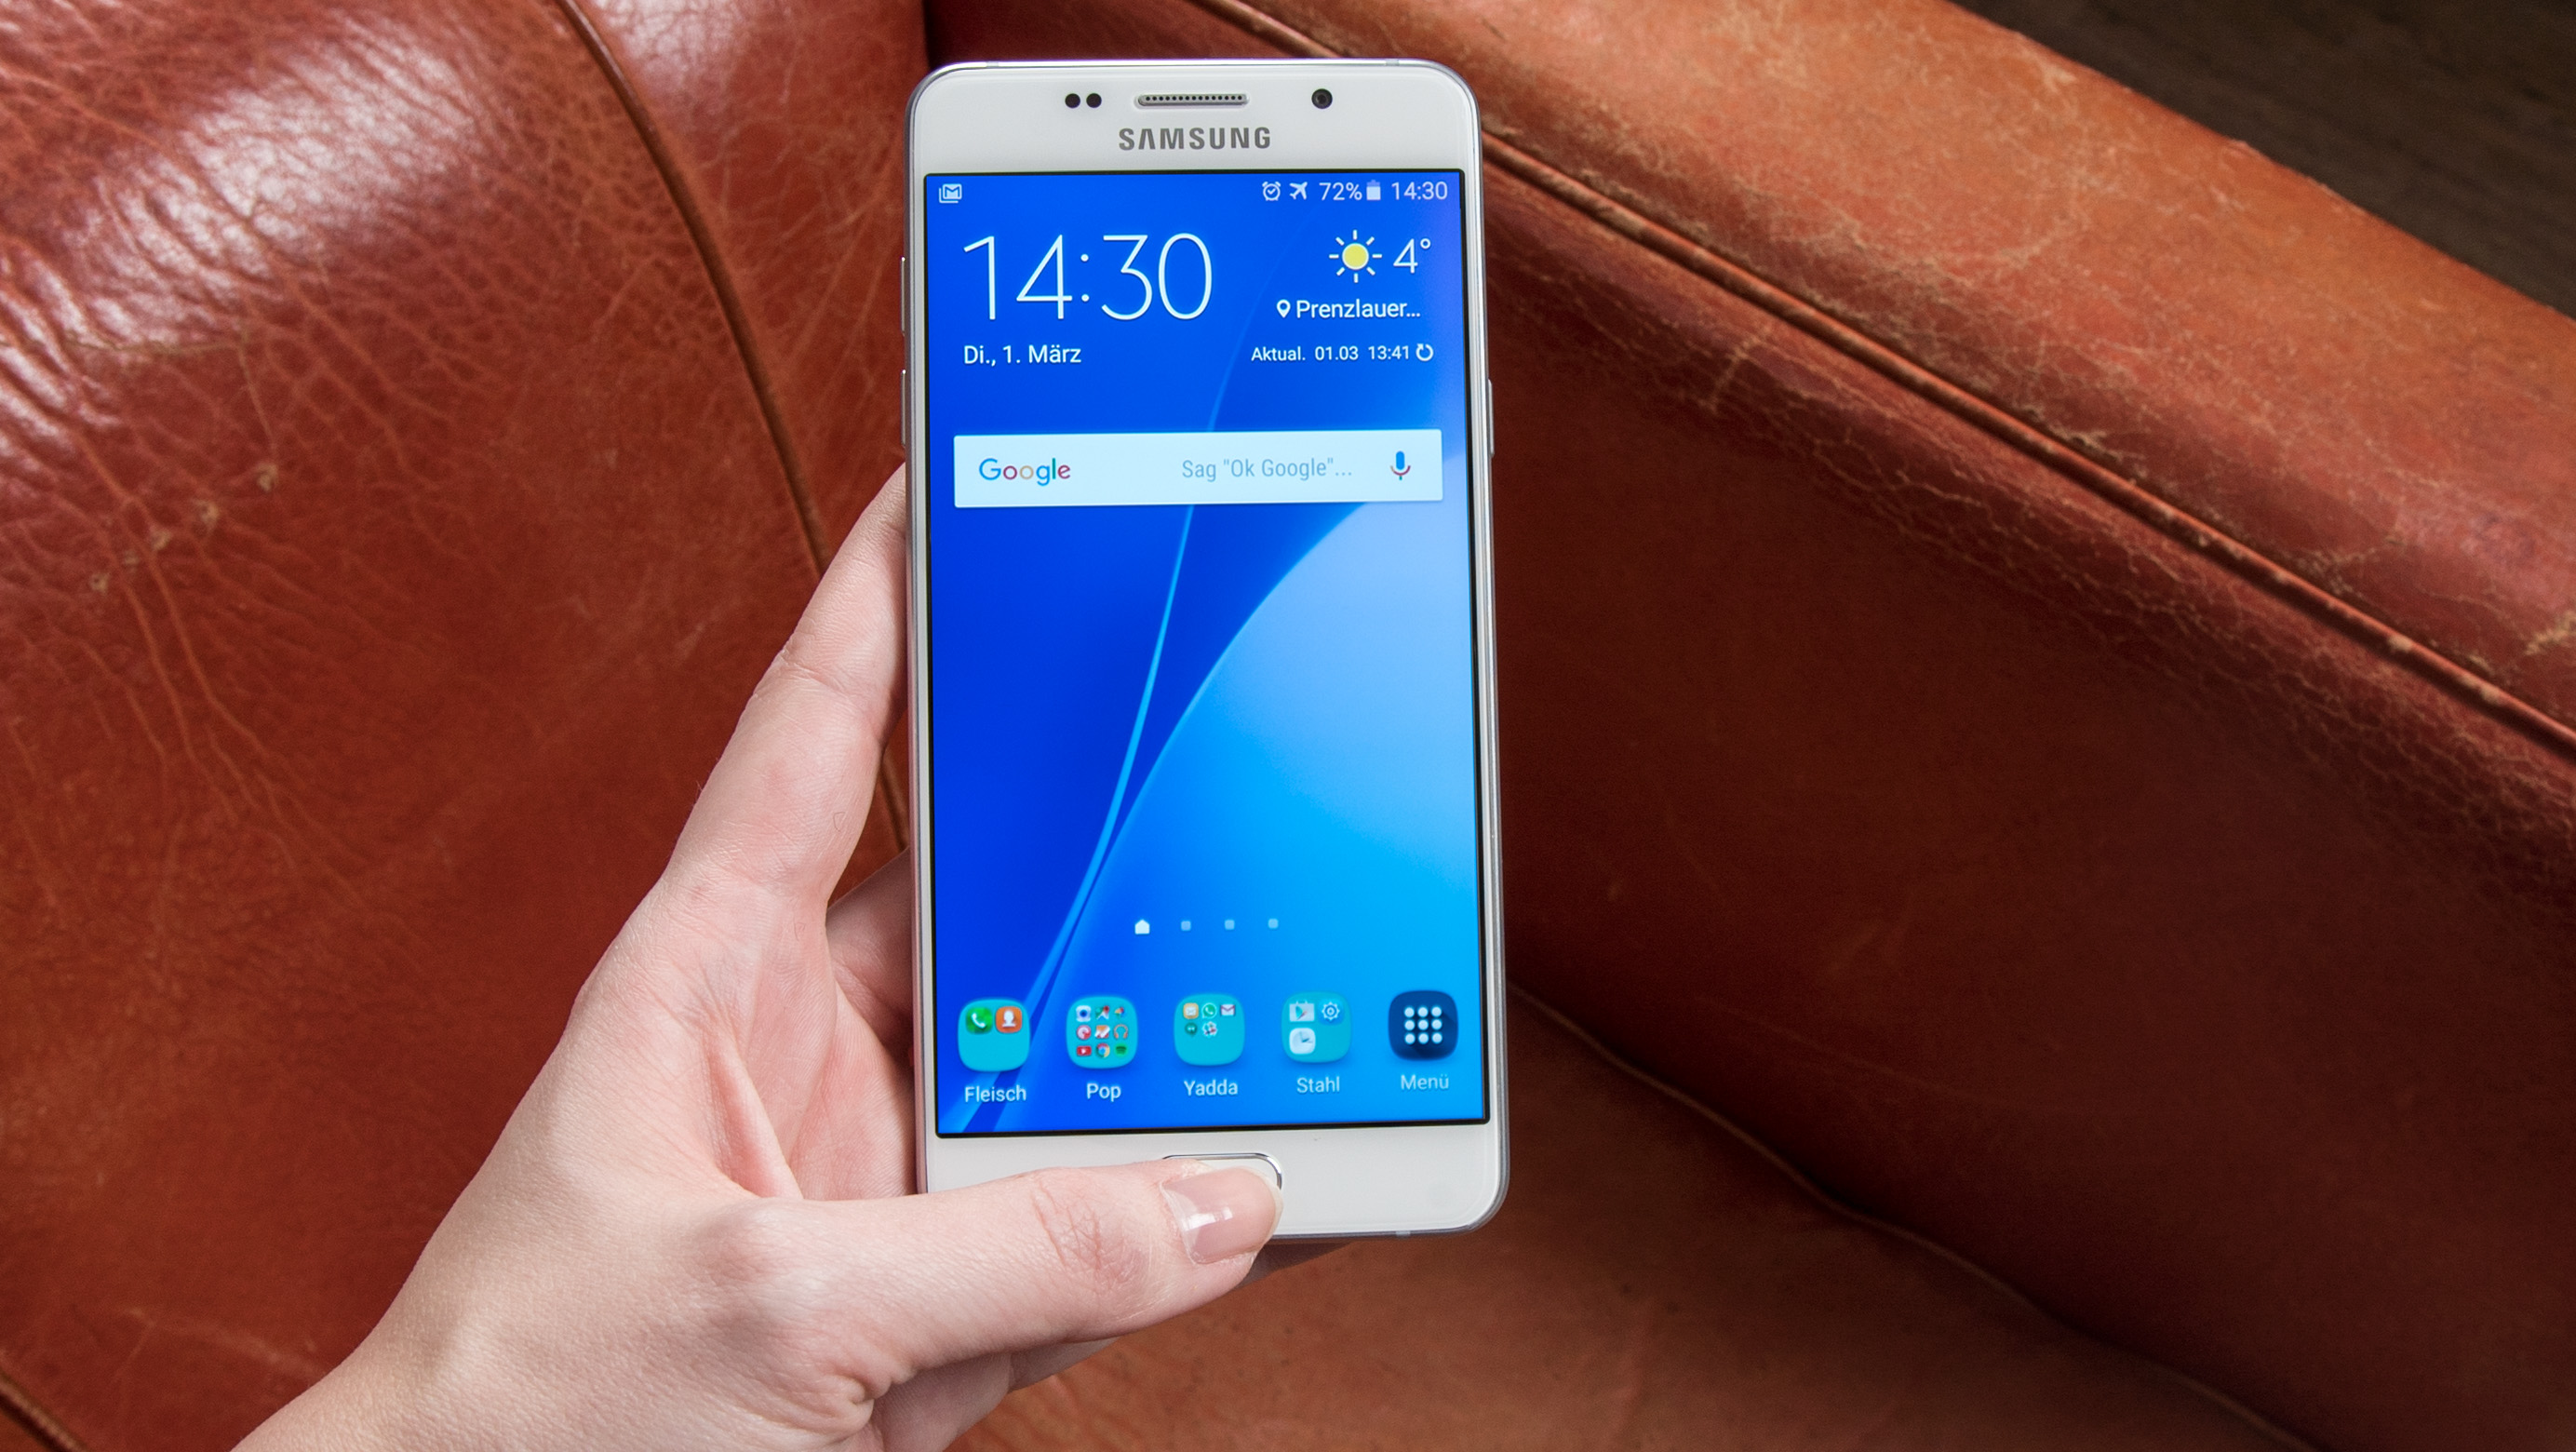 Samsung Galaxy A5 (2016) in the Test